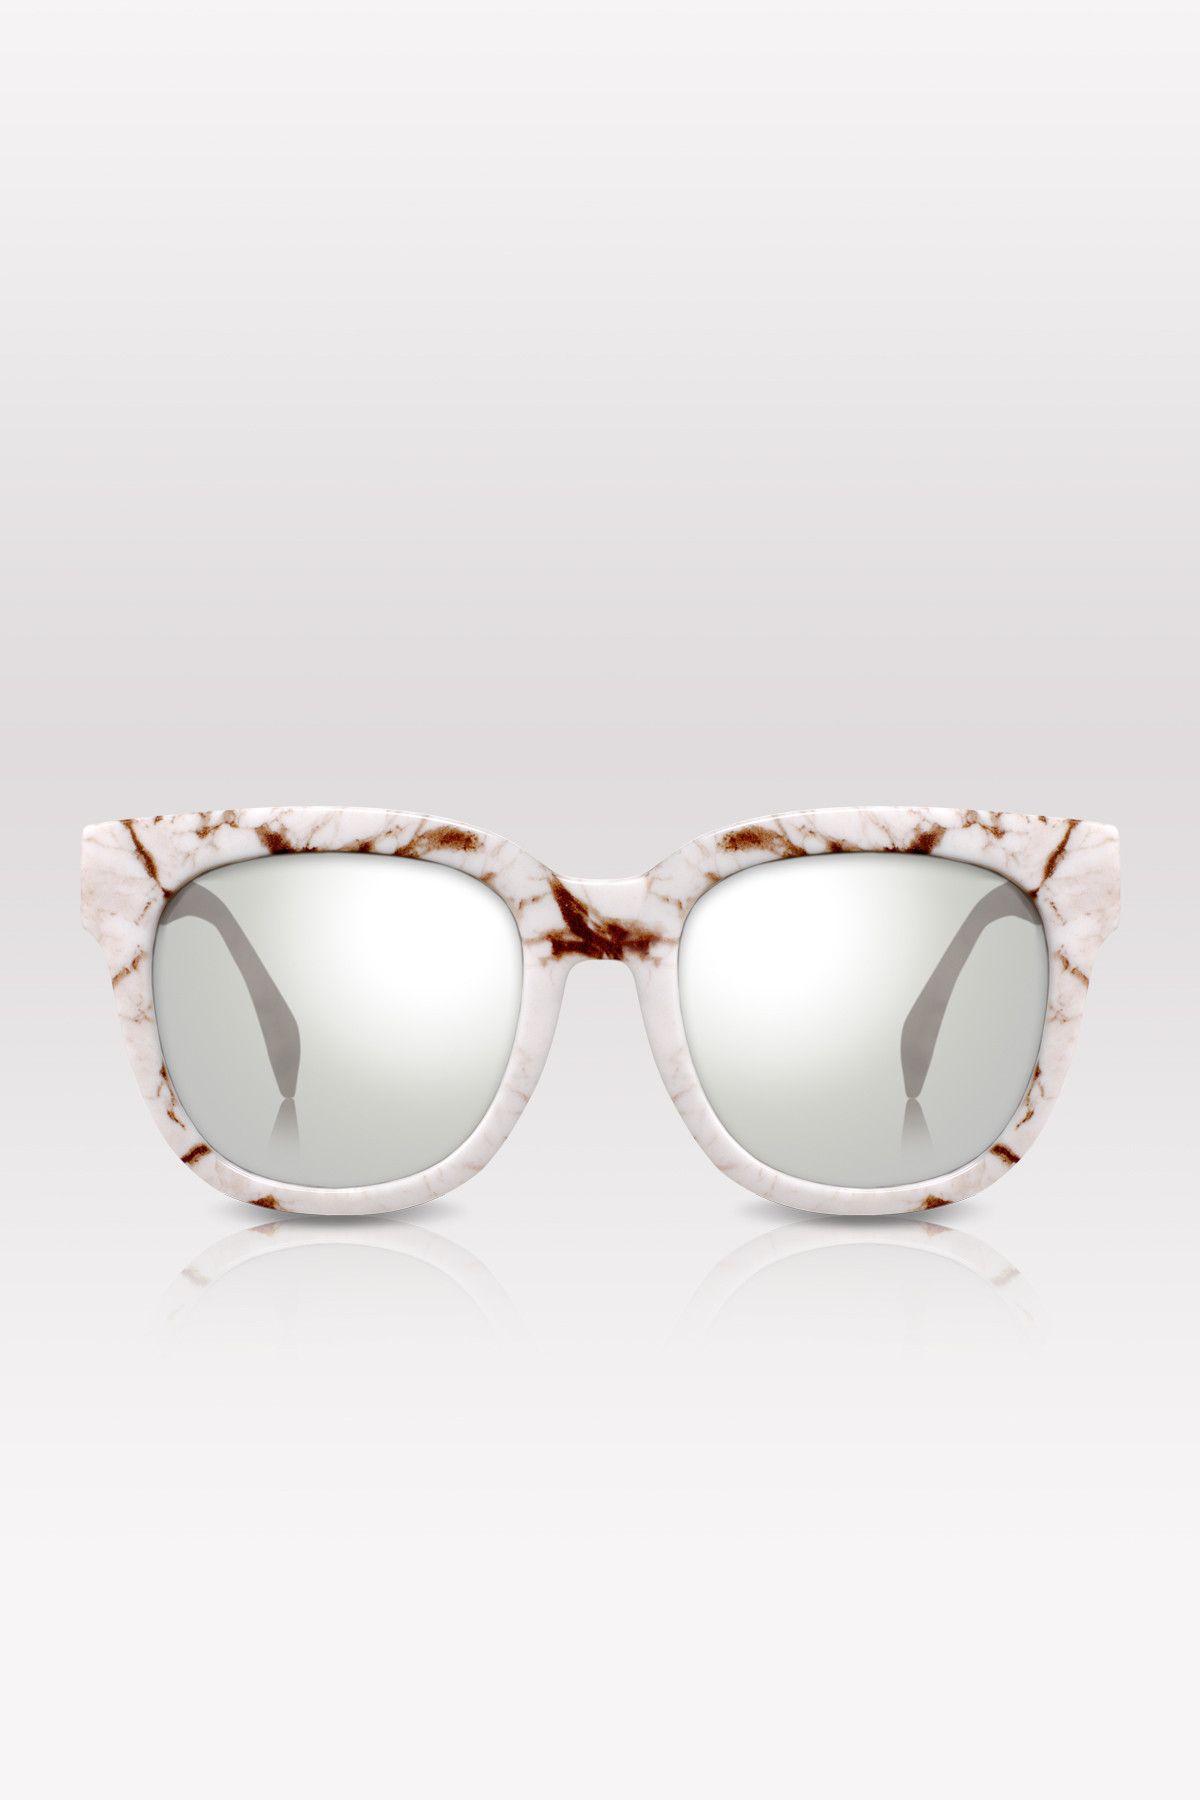 Dawn Patrol Wayfarer sunglasses, Sunglasses, Mirrored